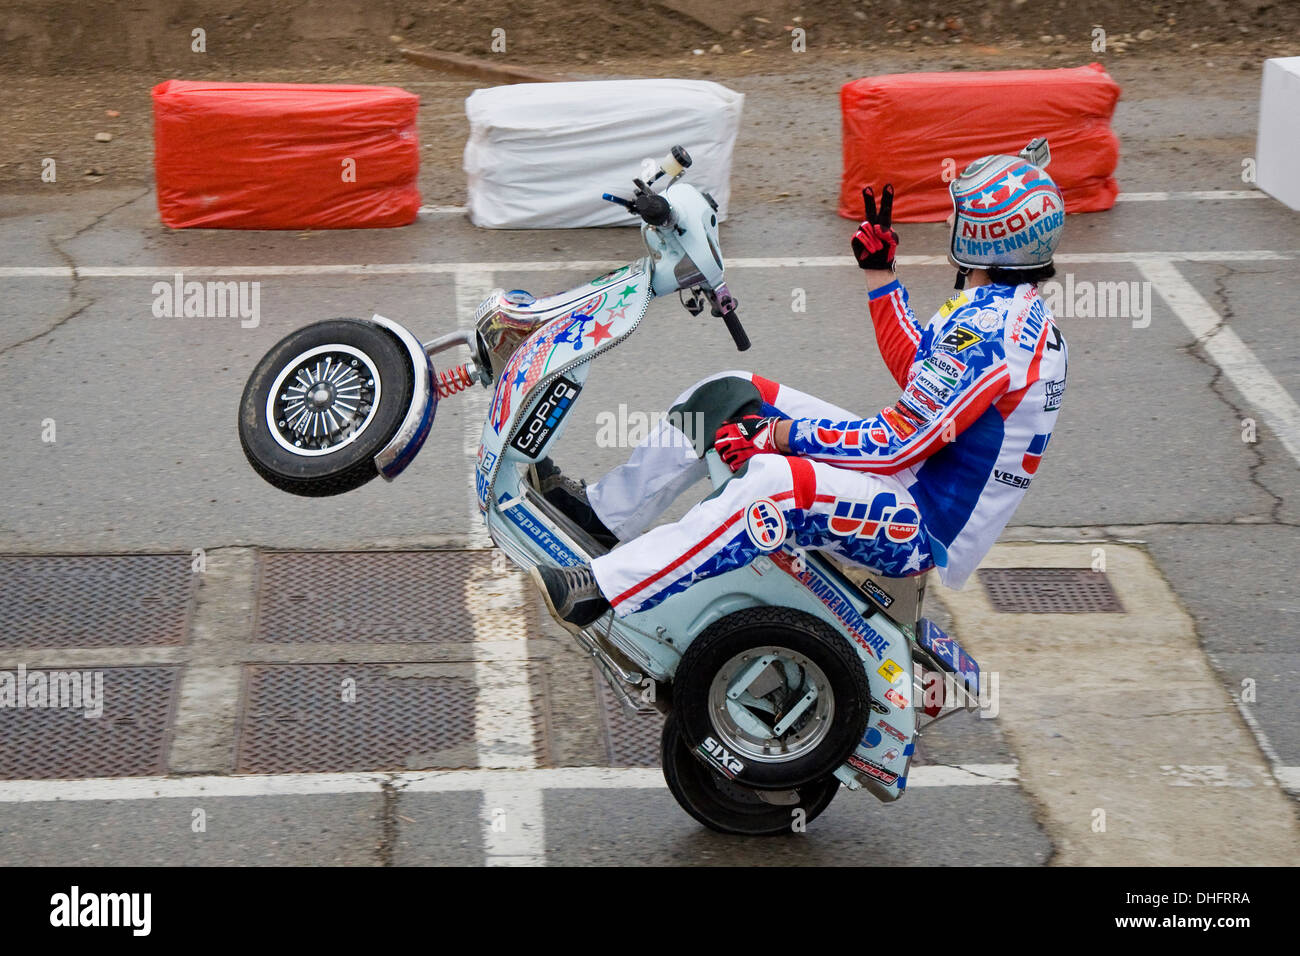 Eicma 2013, Rho Fiera, Italy, International Motorcycle Exhibition, Stuntman - Stock Image